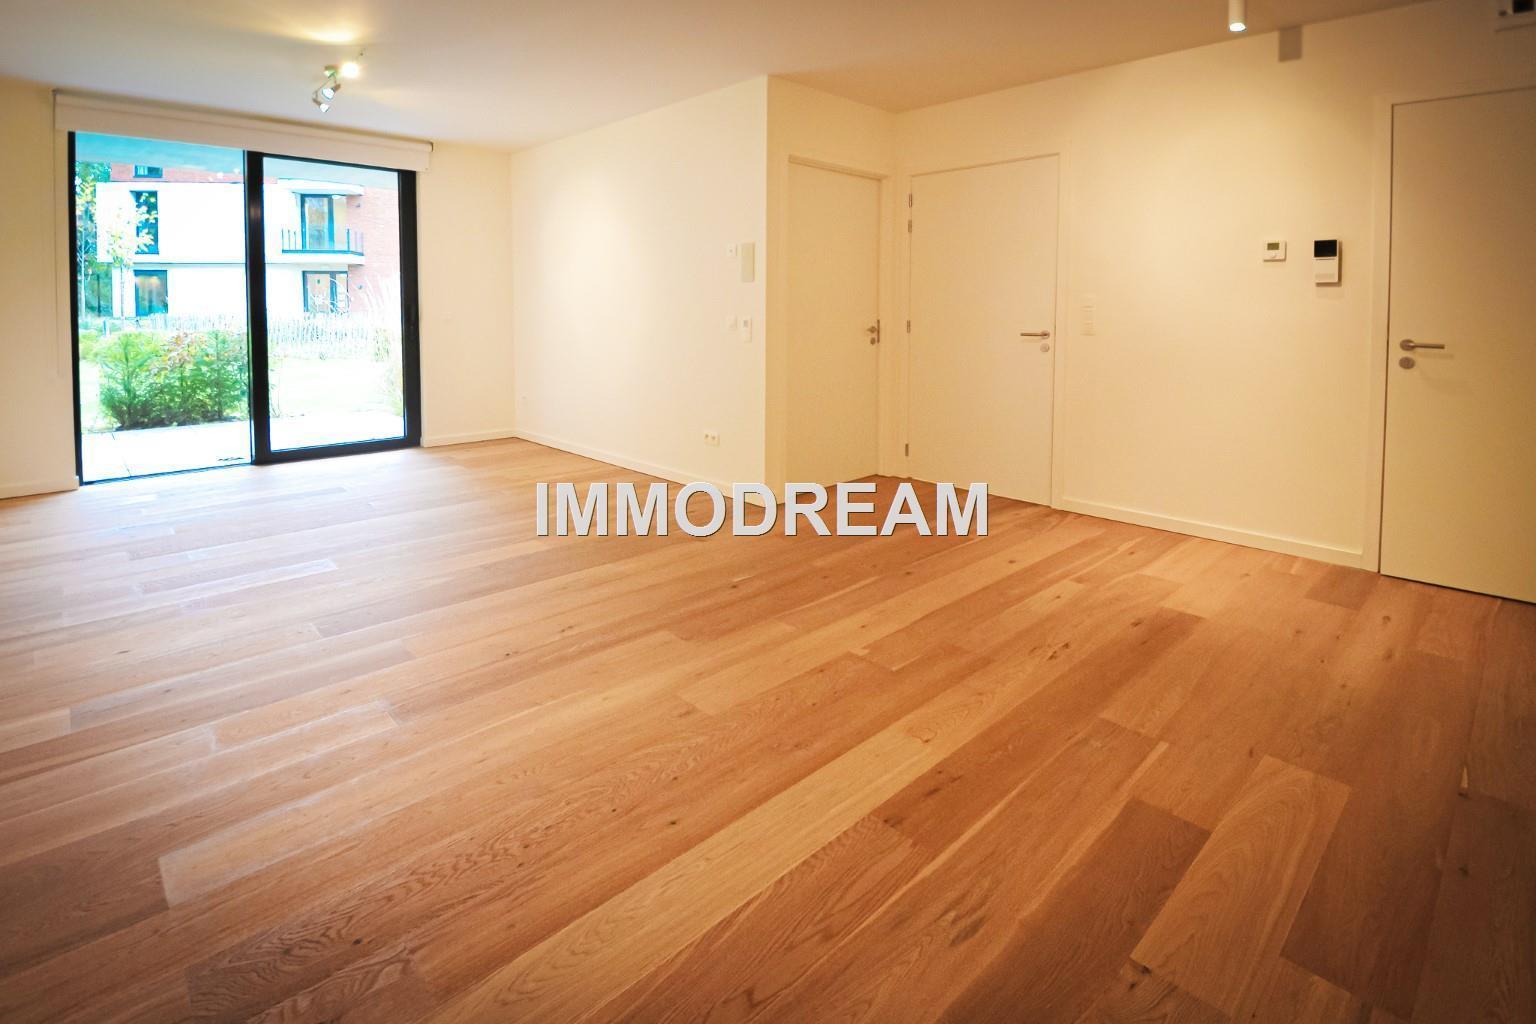 Residences-services - Wezembeek-Oppem - #3909185-2